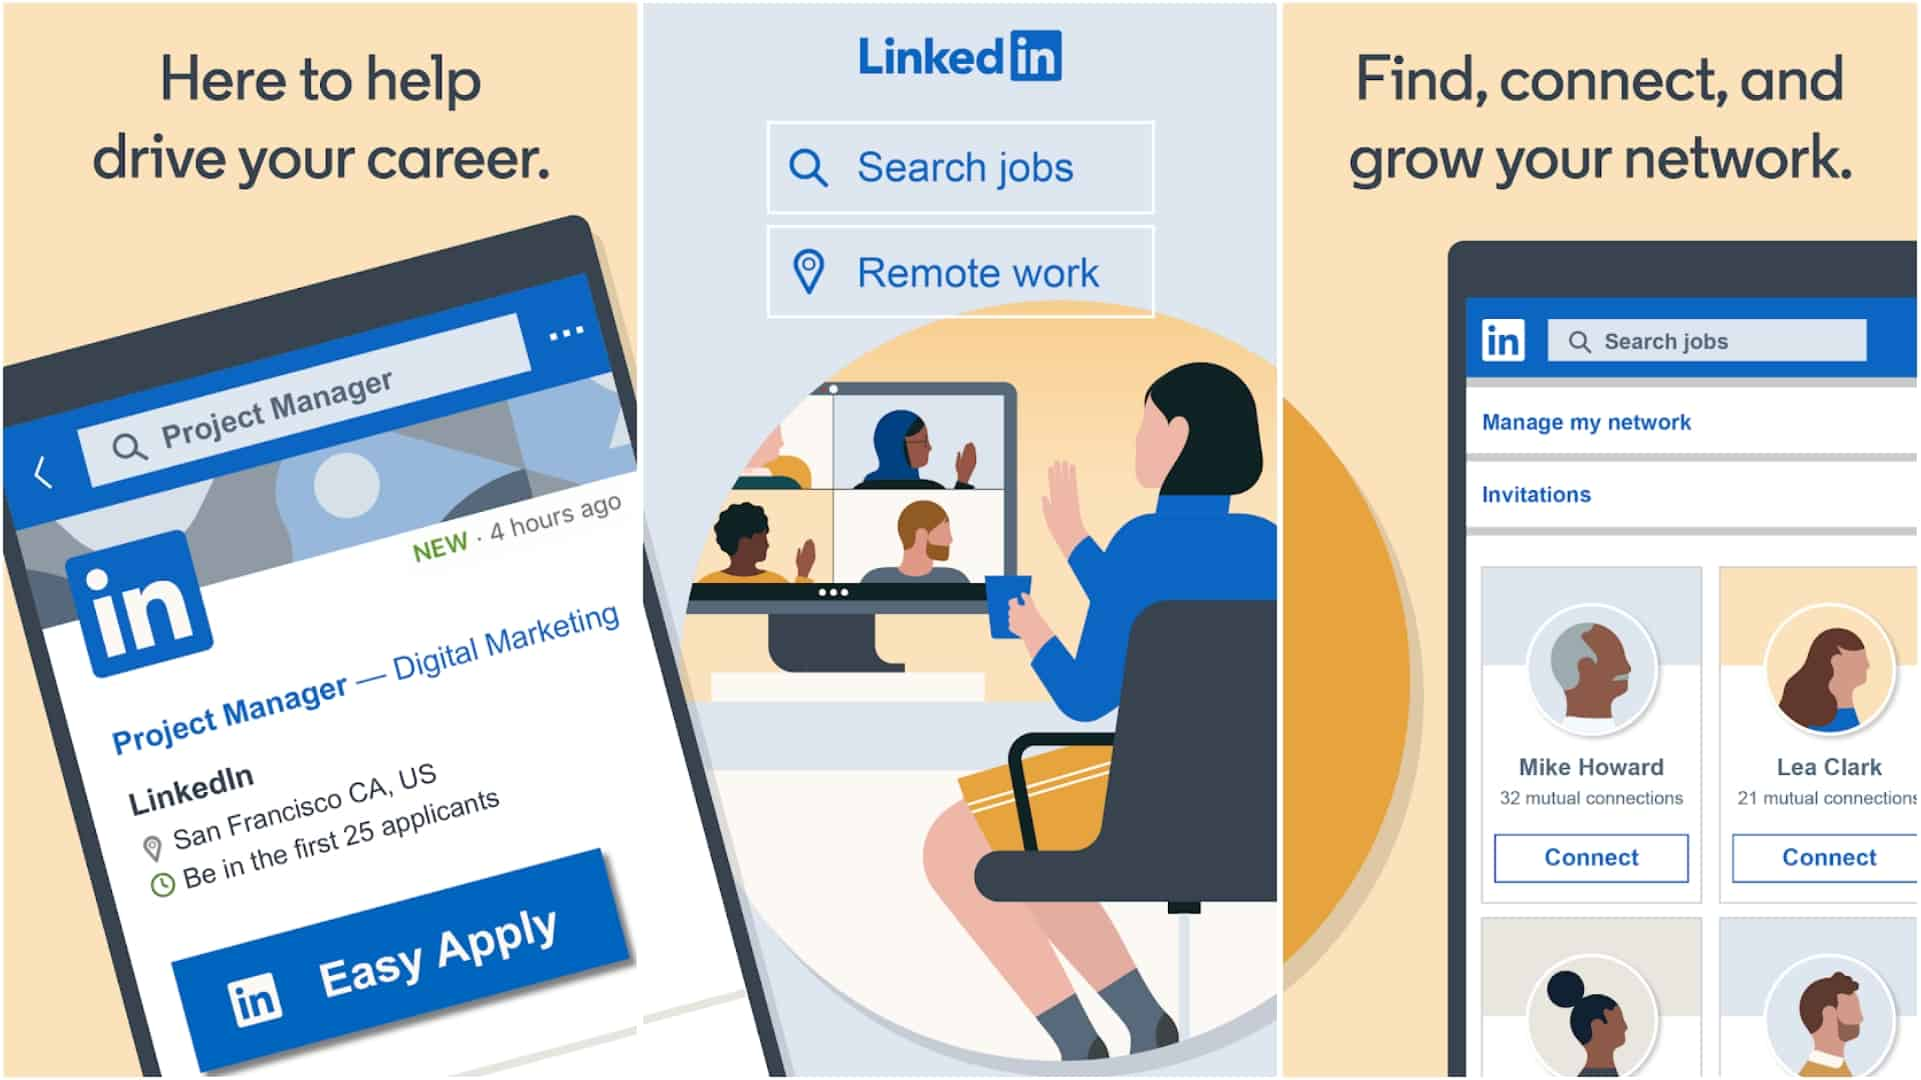 LinkedIn app image June 2020